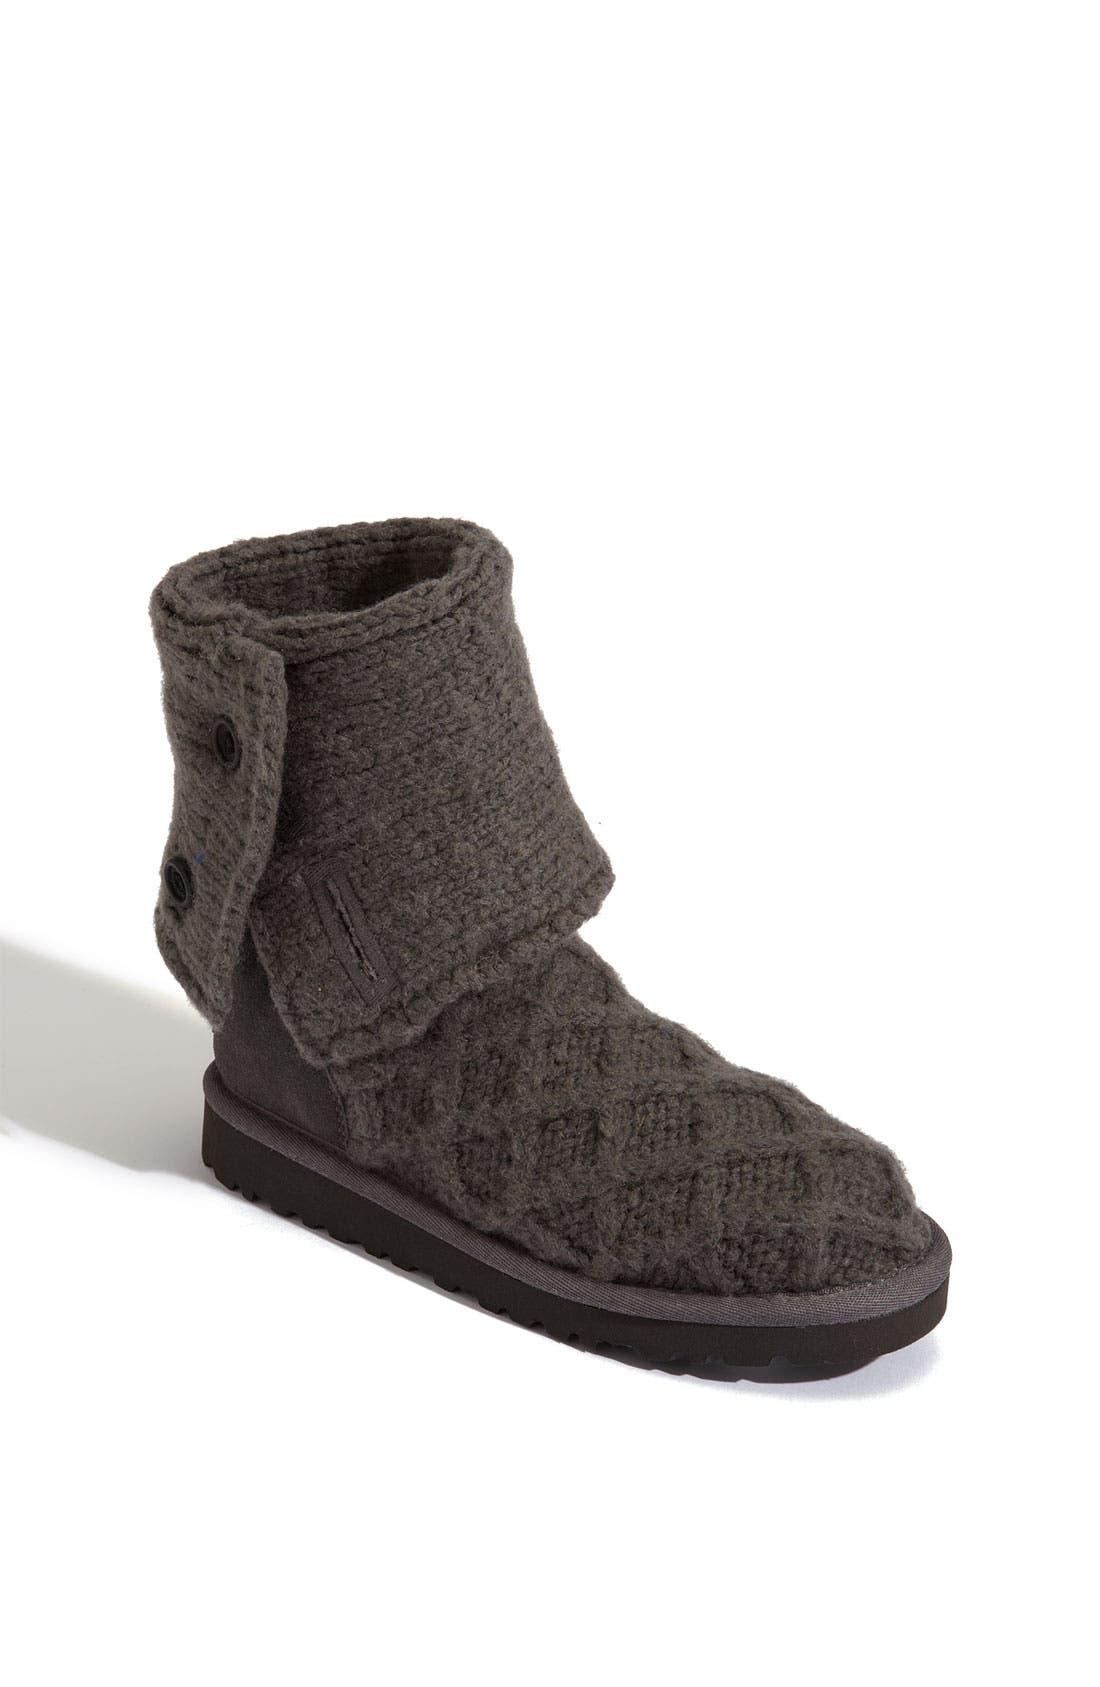 Main Image - UGG® Australia 'Lattice Cardy' Boot (Toddler, Little Kid & Big Kid)